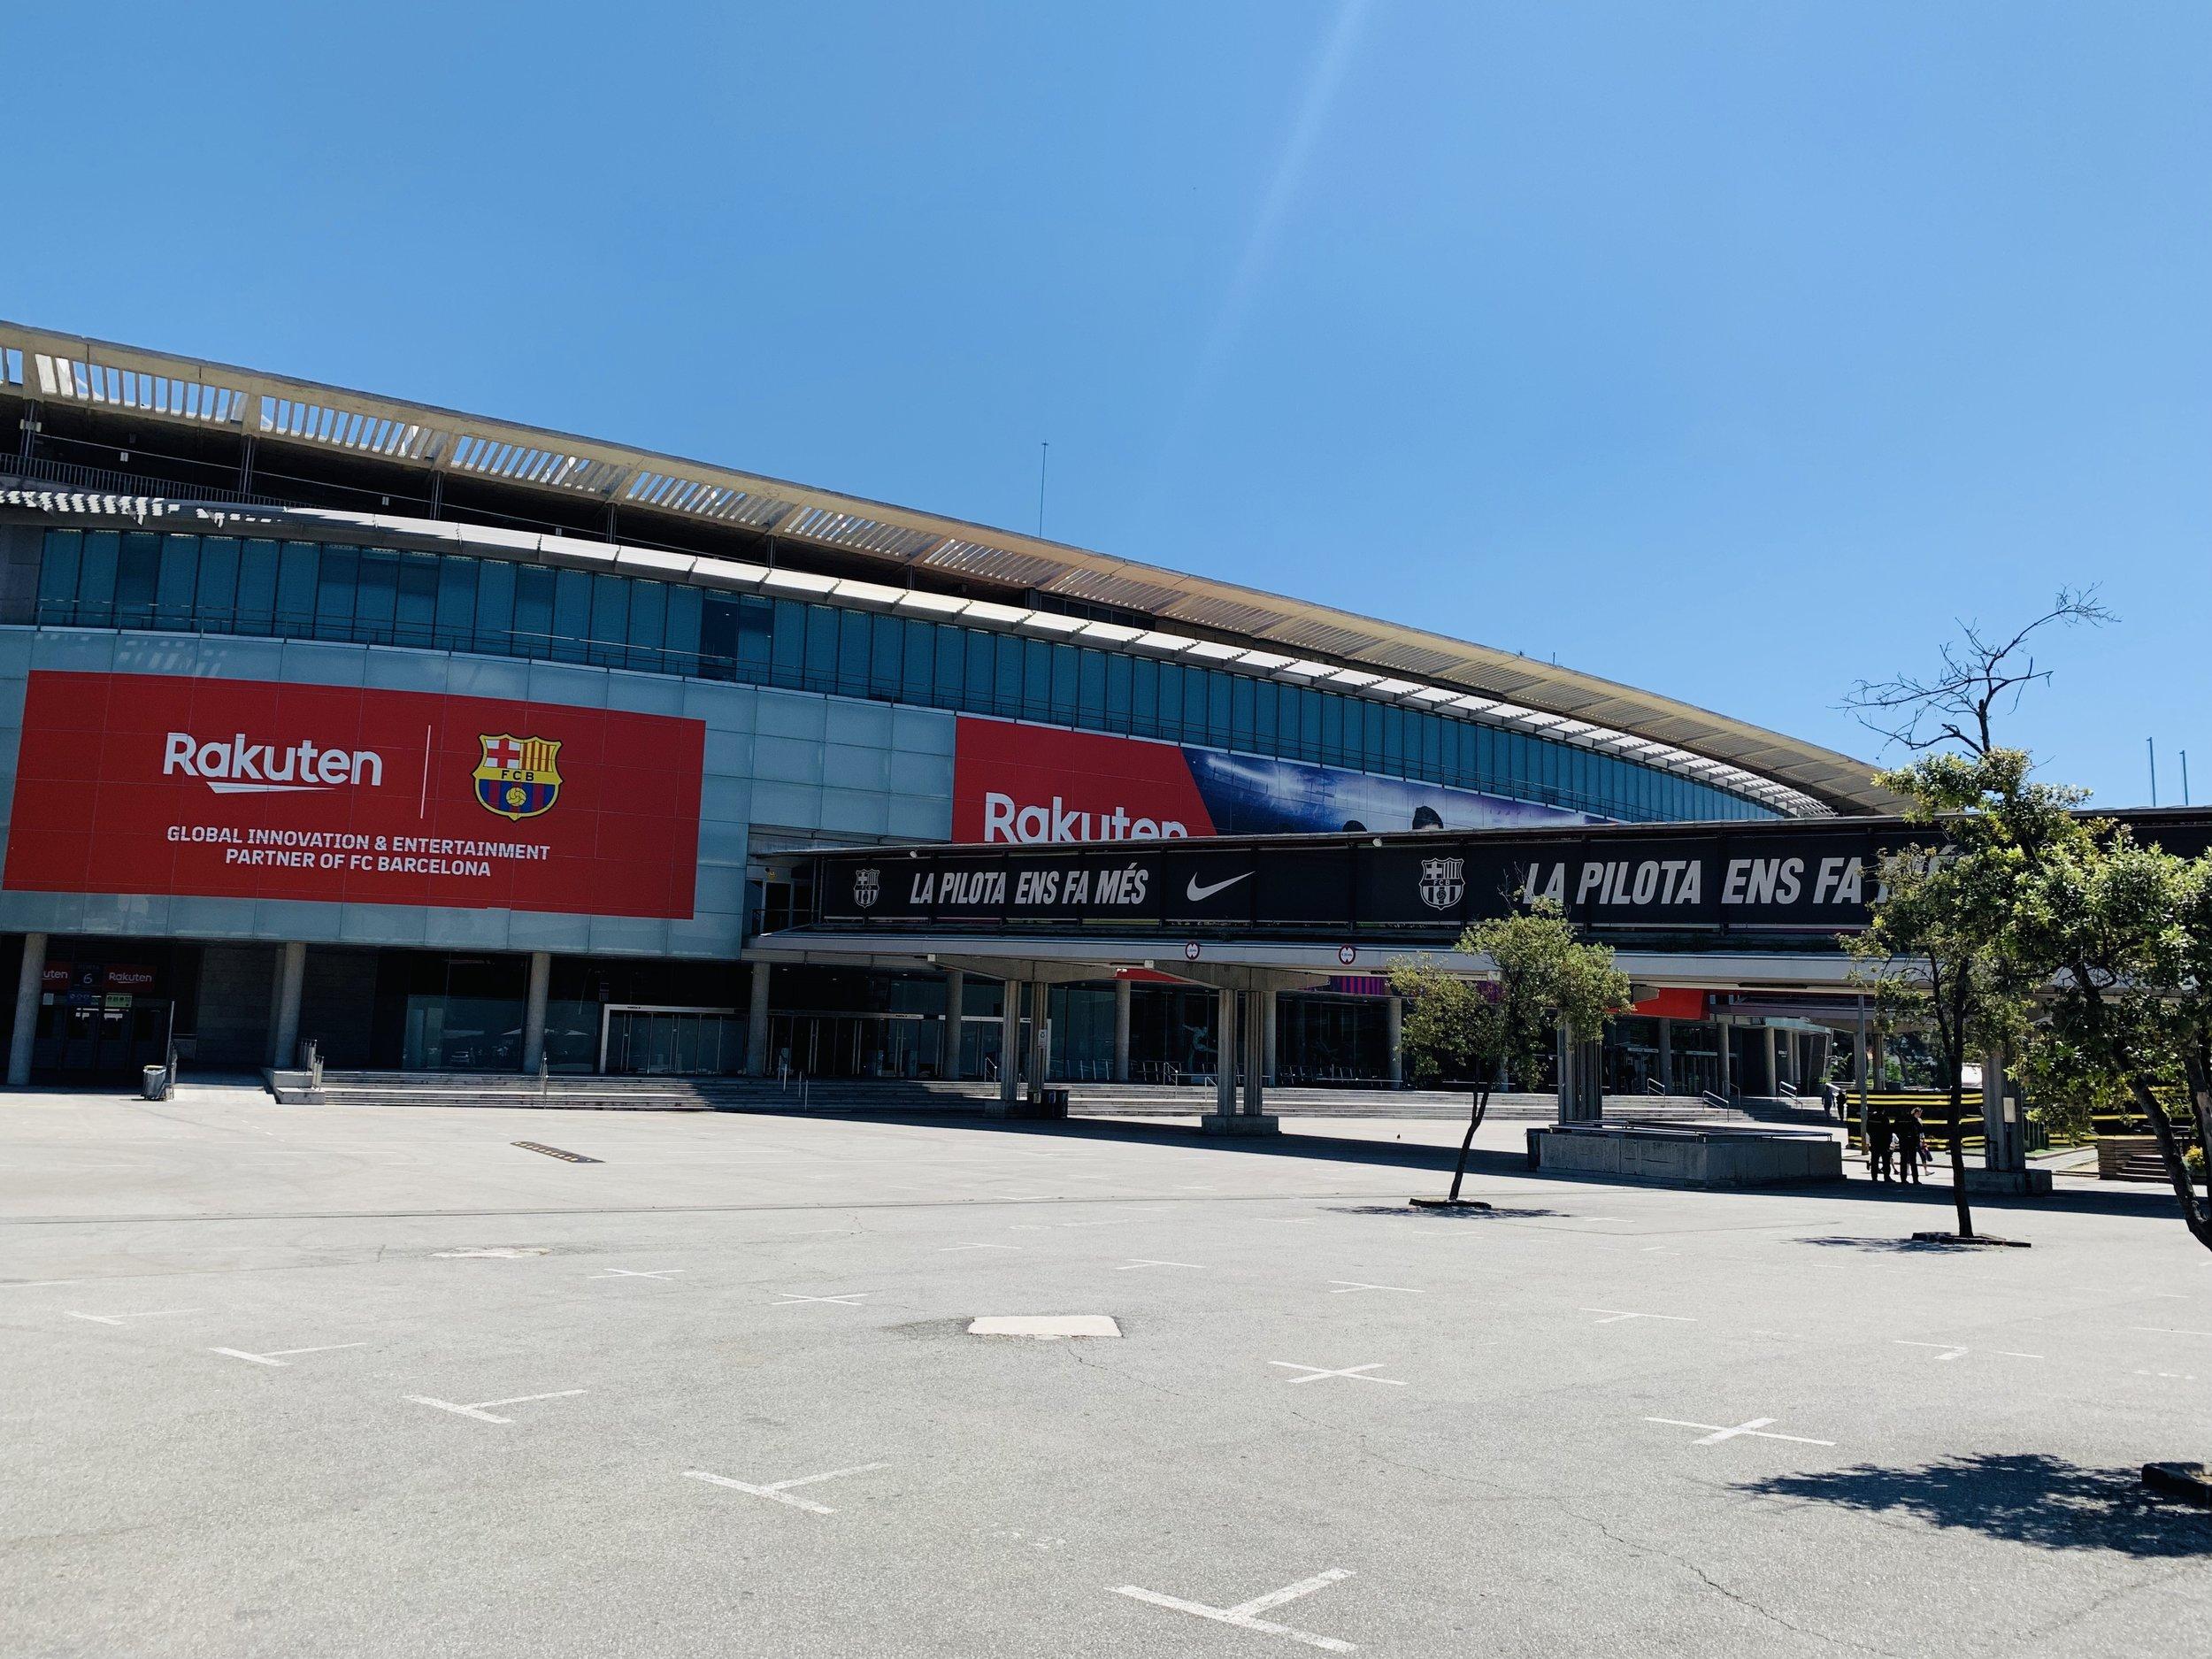 Camp Nou Stadium in Barcelona